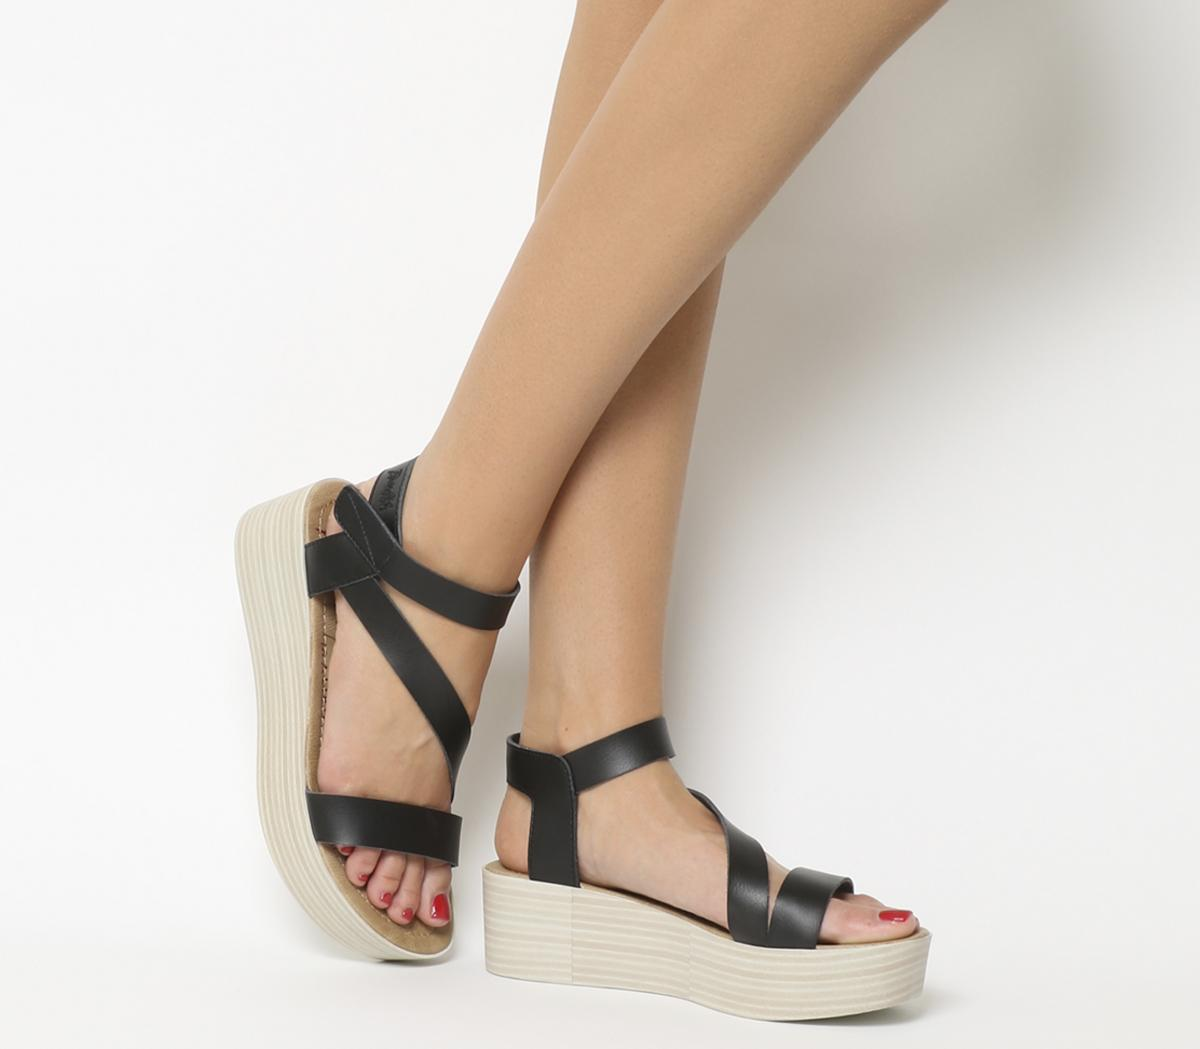 17e075e60b Blowfish Lover Flatform Sandals Onyx Dyecut - Mid Heels